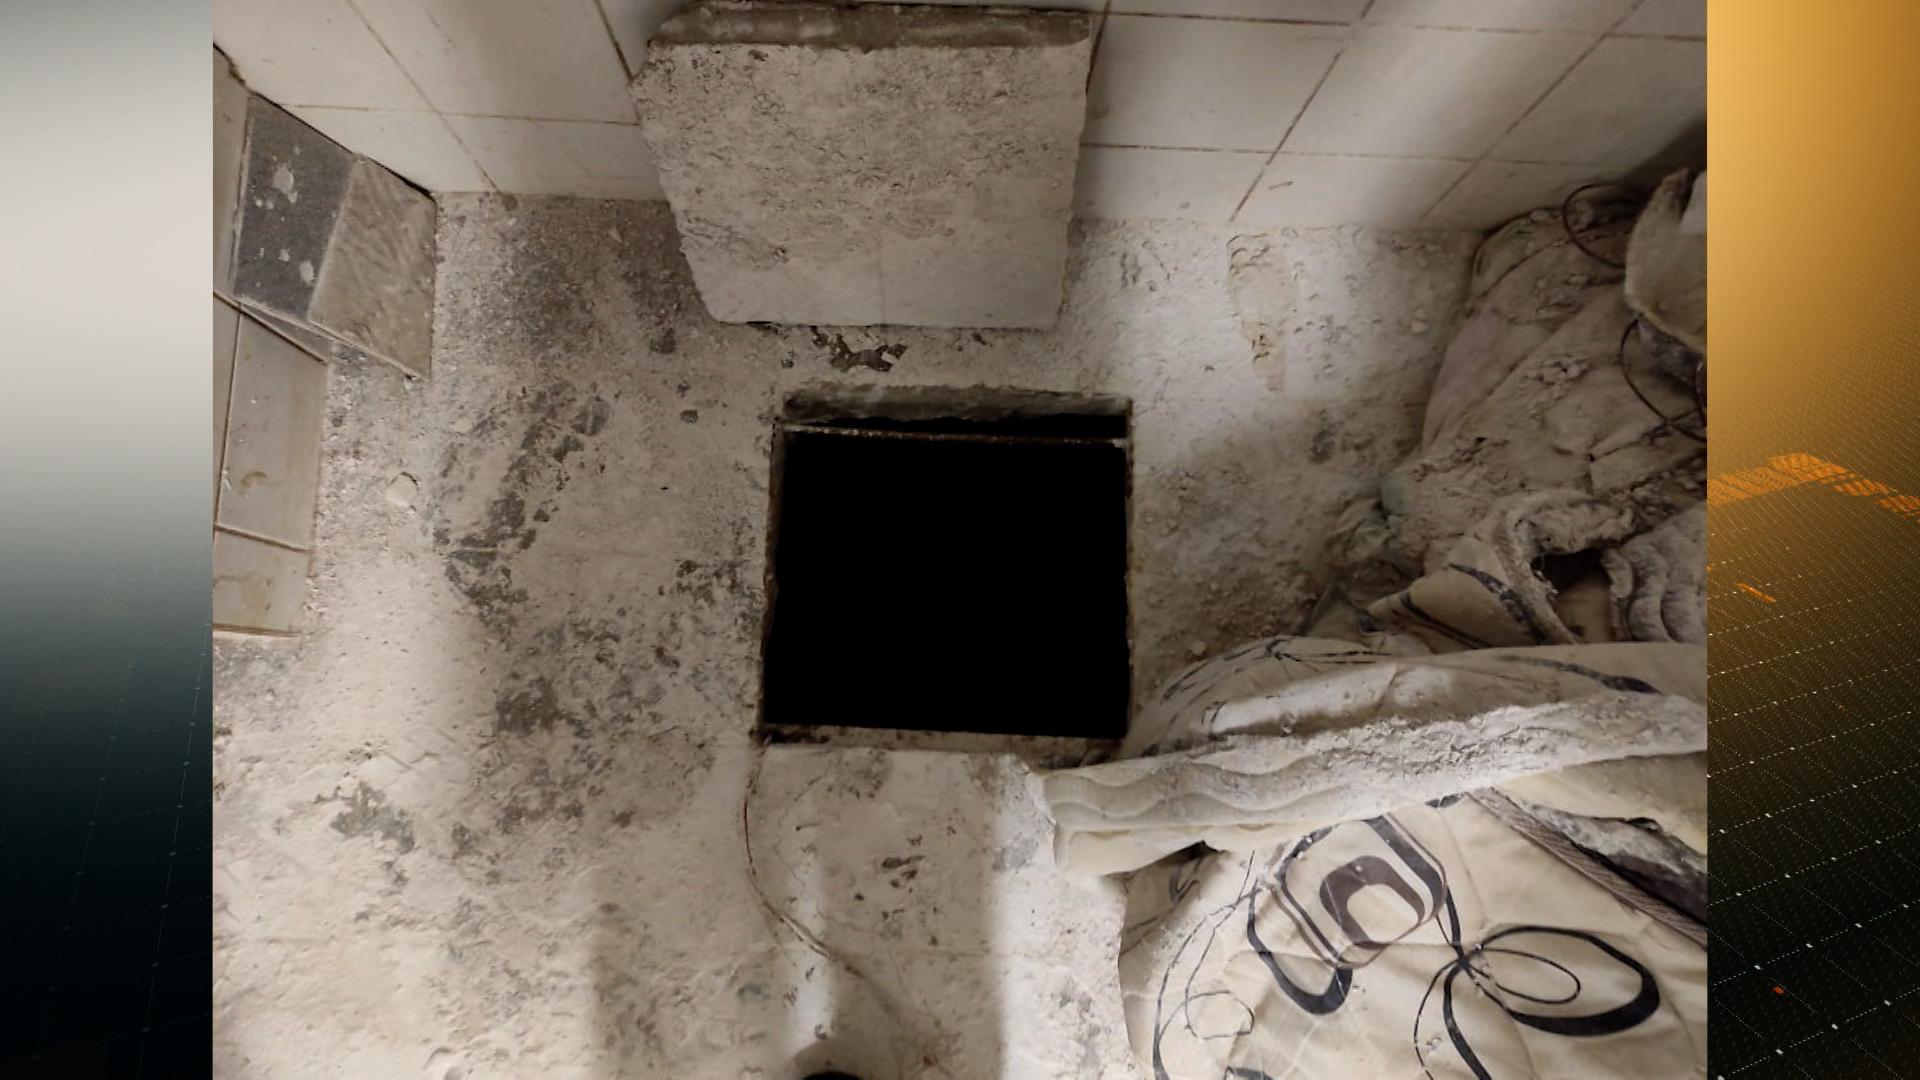 Polícia descobre túnel escavado no centro de Poços de Caldas